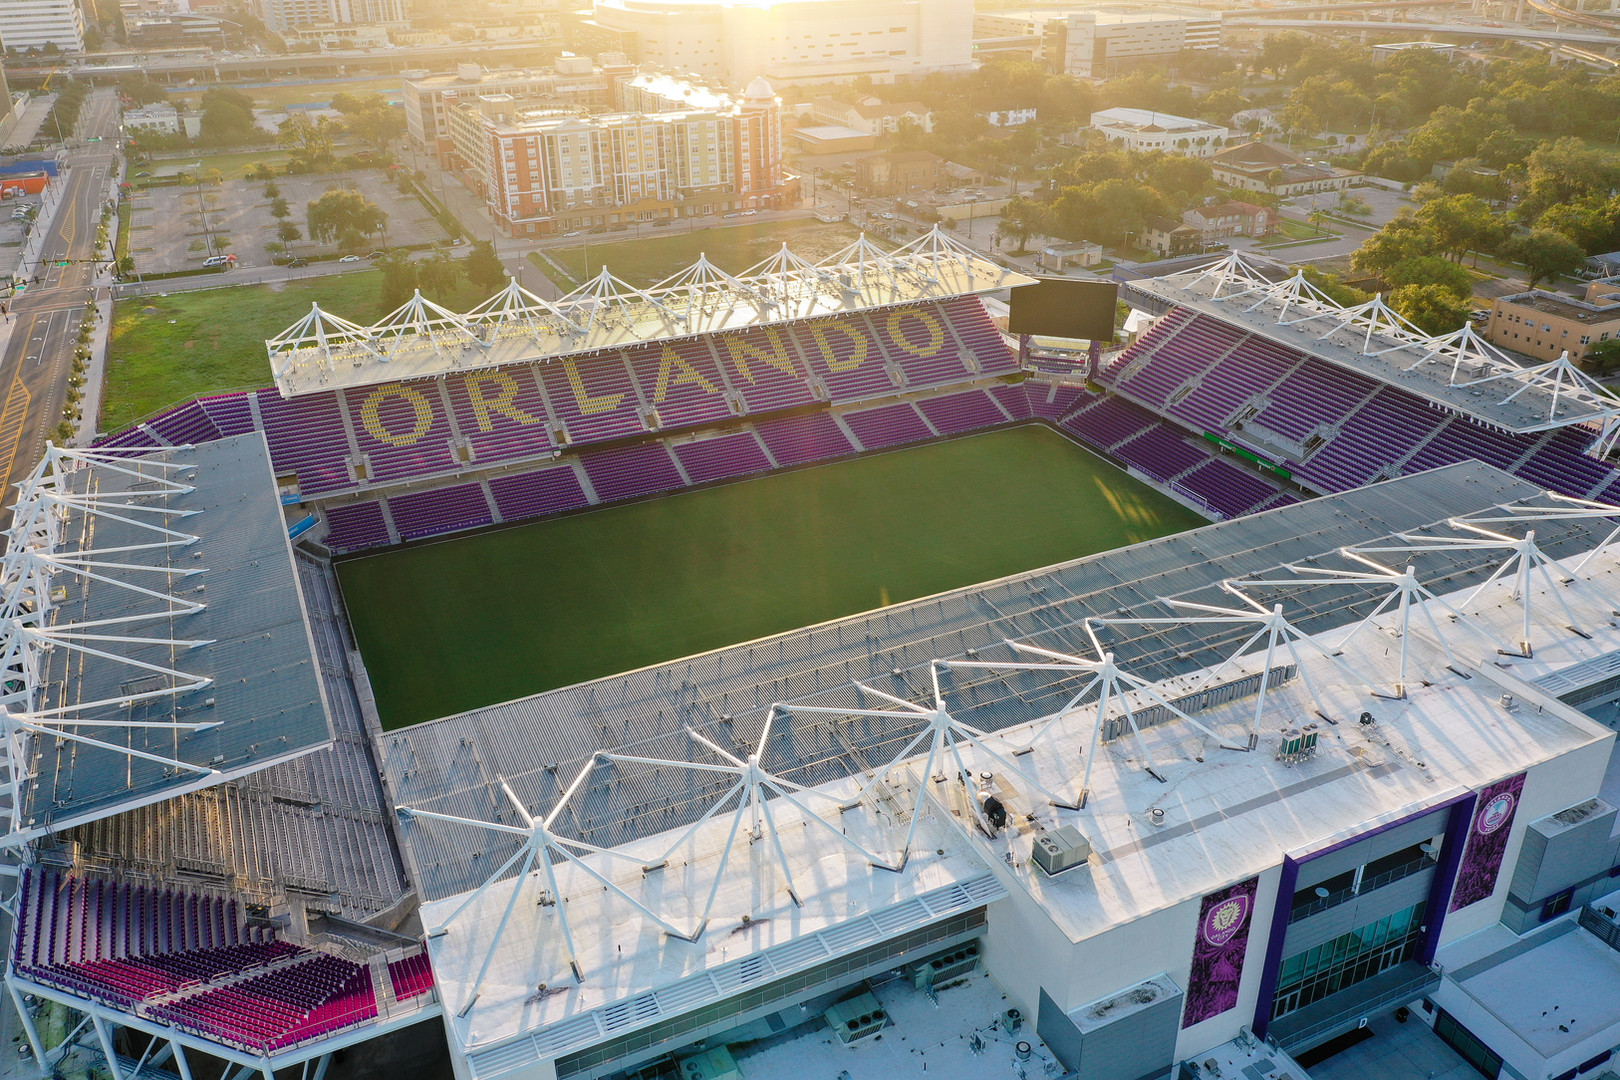 Orlando Soccer Stadium